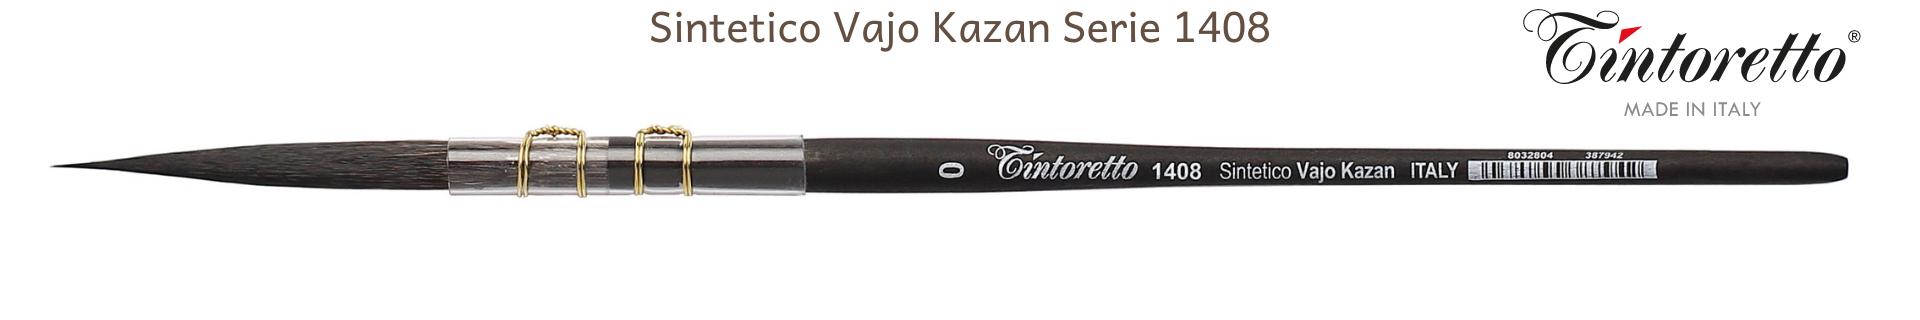 Tintoretto 1408 Vajo Kazan